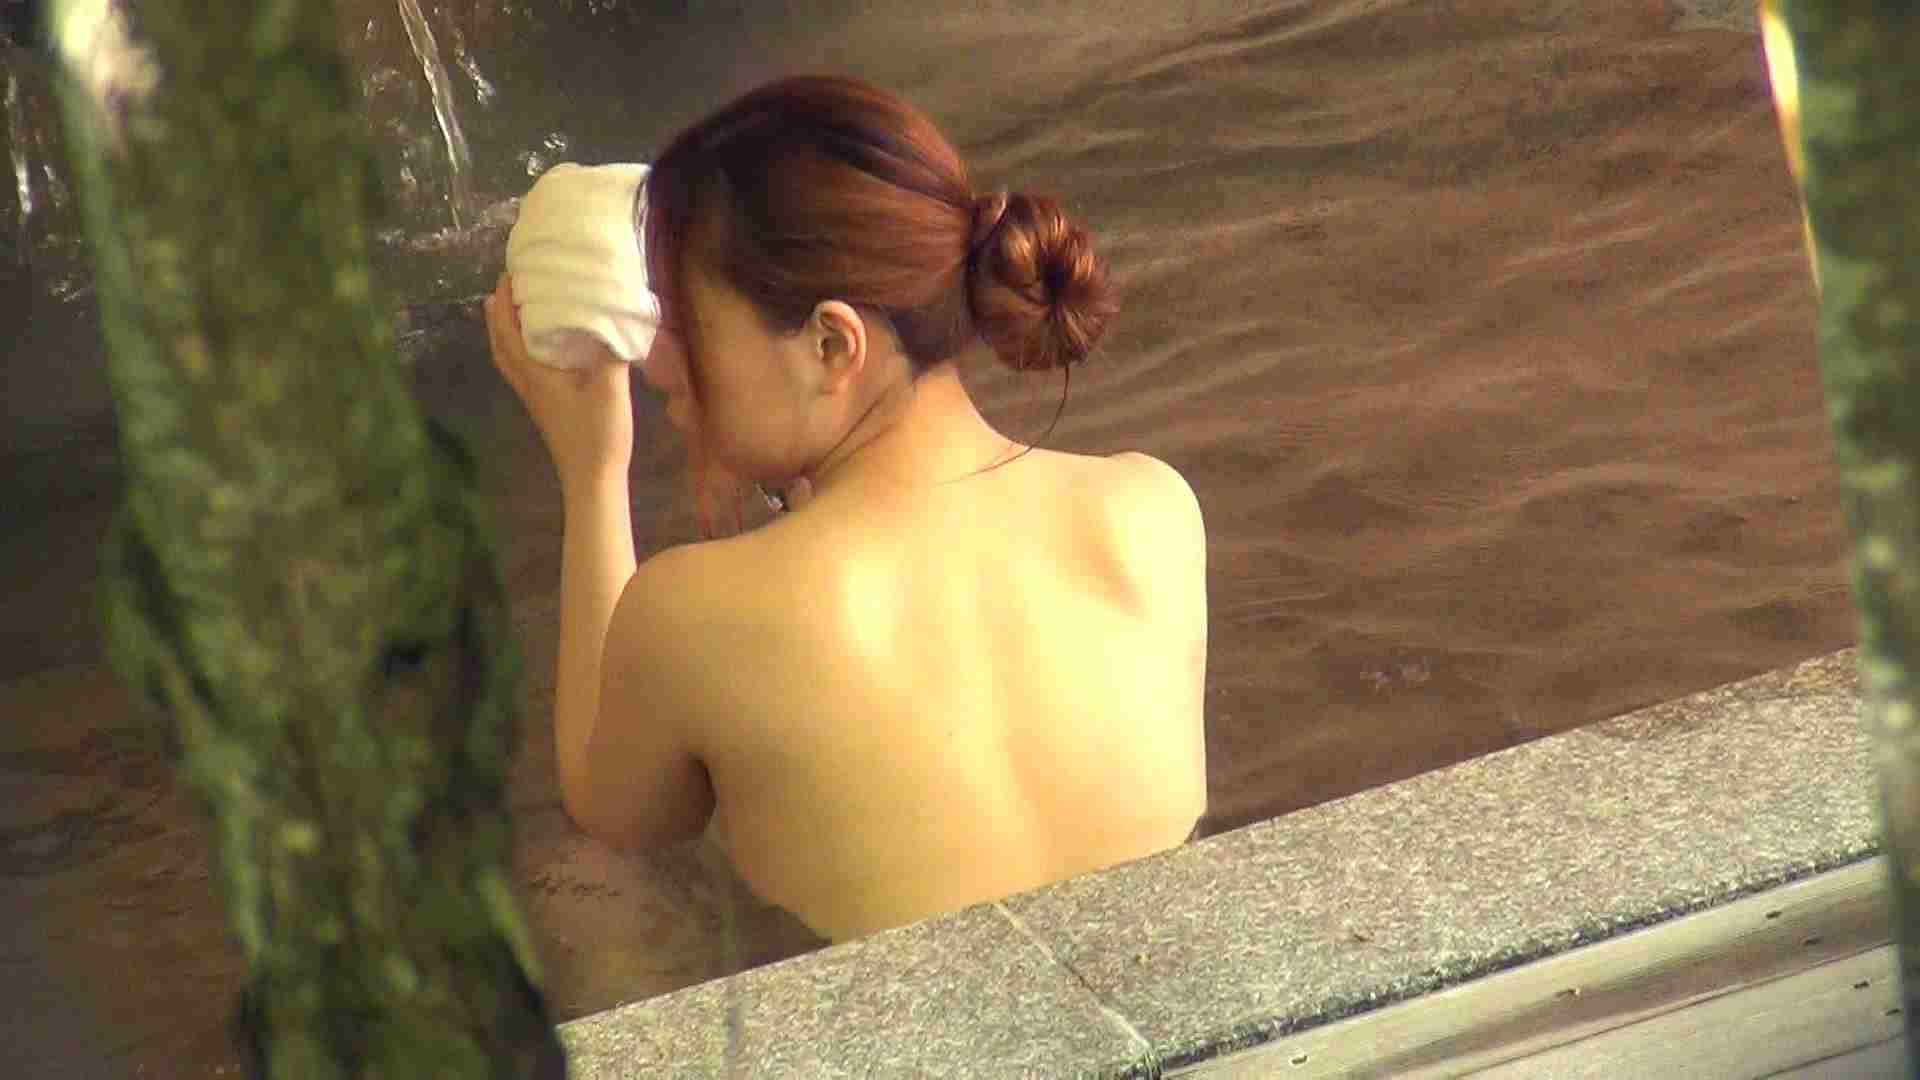 Aquaな露天風呂Vol.270 OLセックス 盗撮アダルト動画キャプチャ 111画像 44